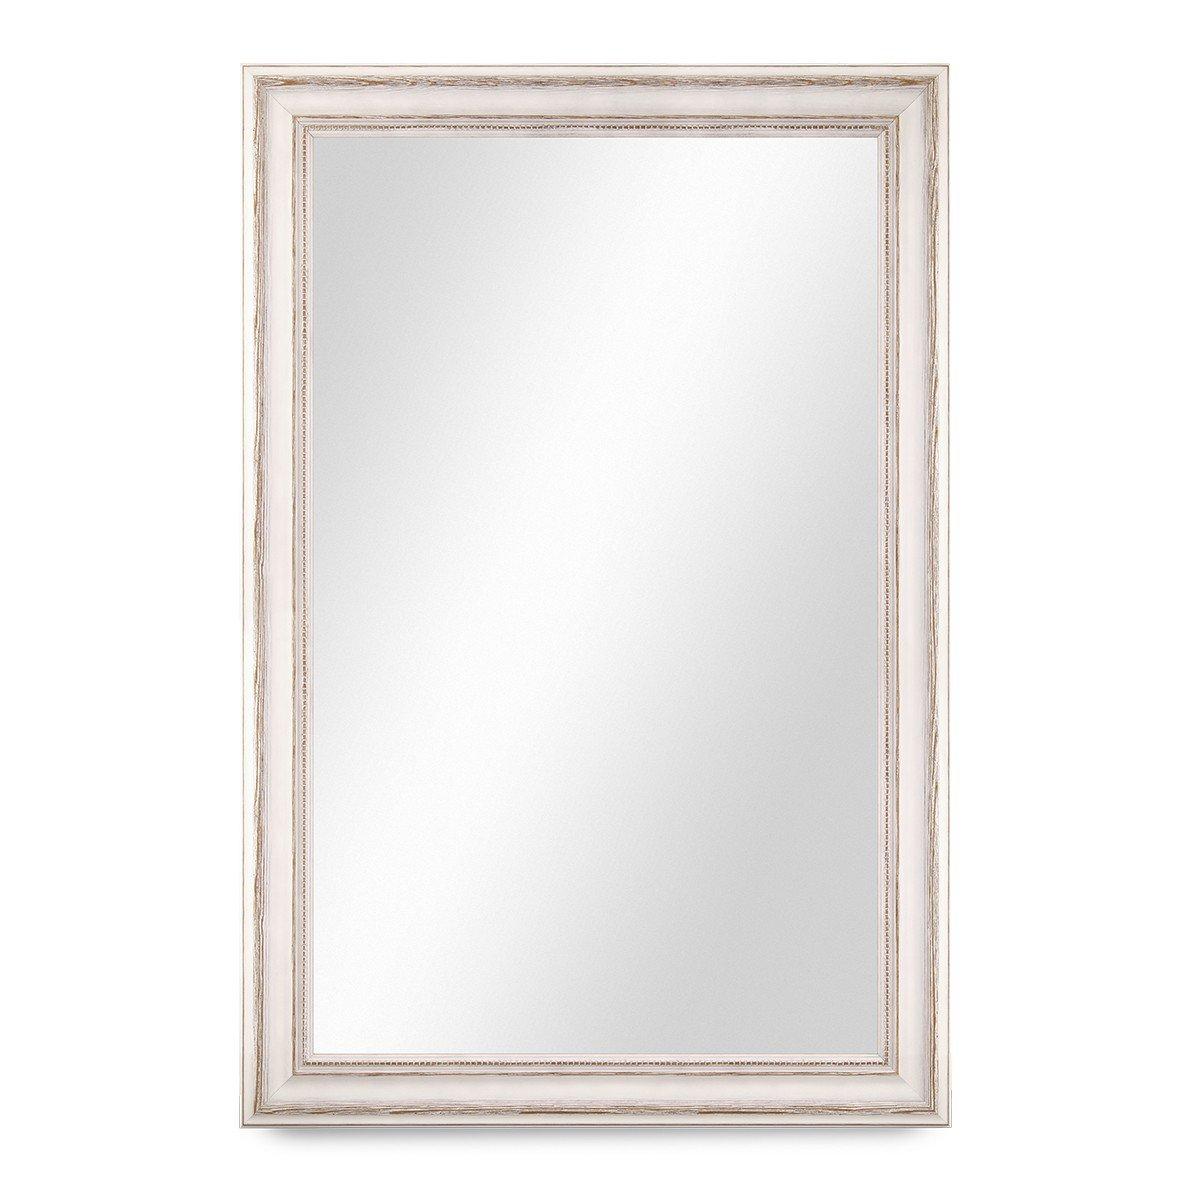 PHOTOLINI Wand-Spiegel 50x60 cm im Massivholz-Rahmen Landhaus-Stil ...